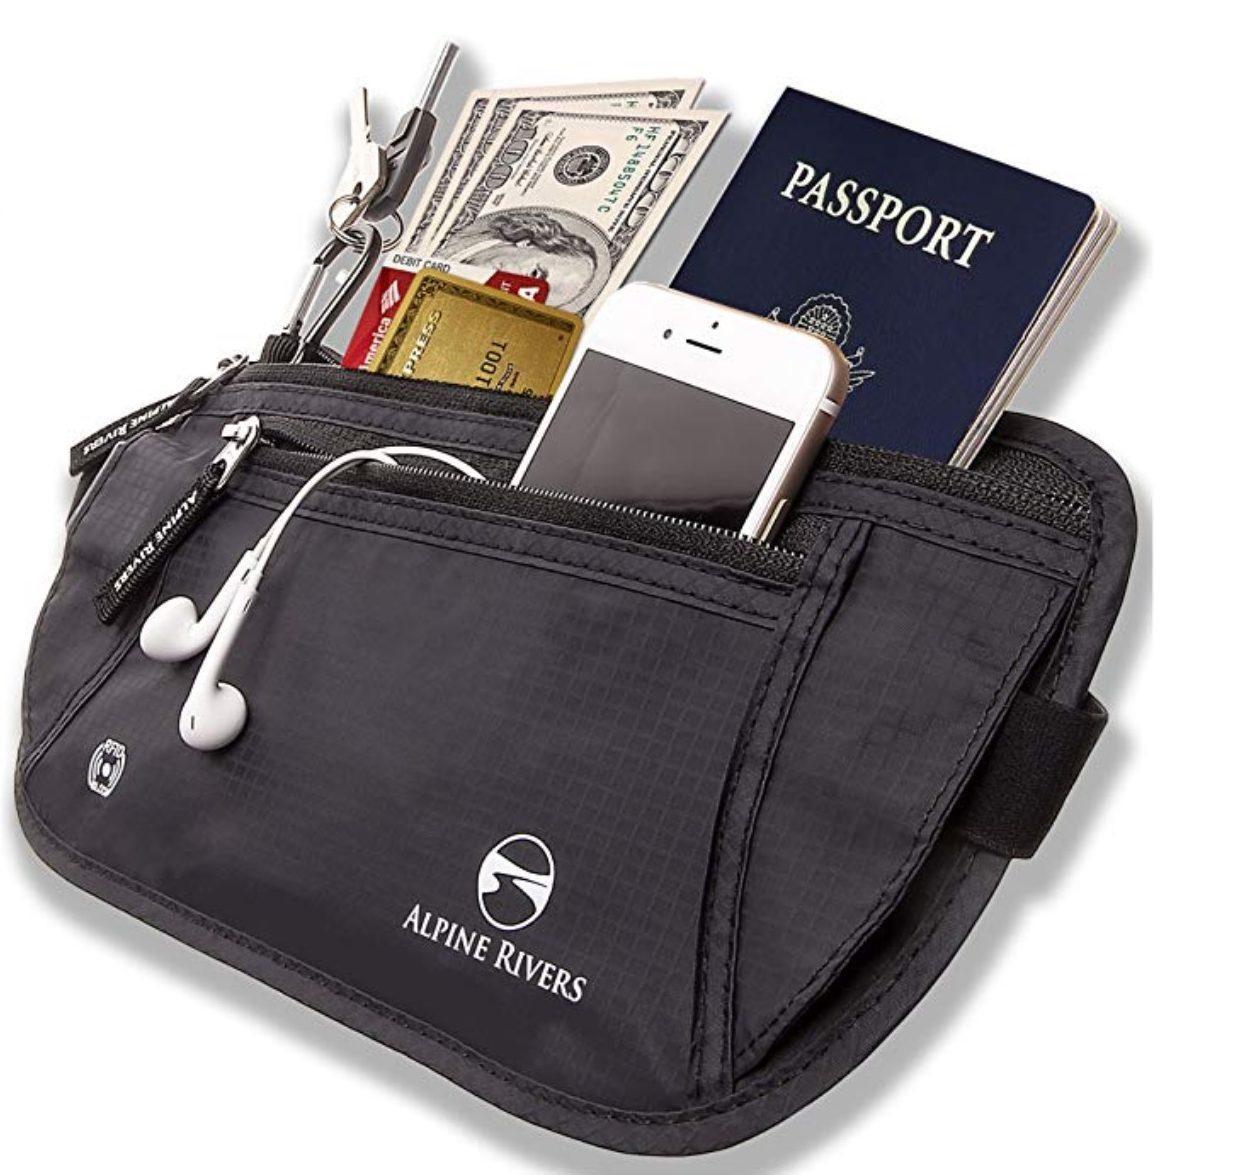 best money belts for travel